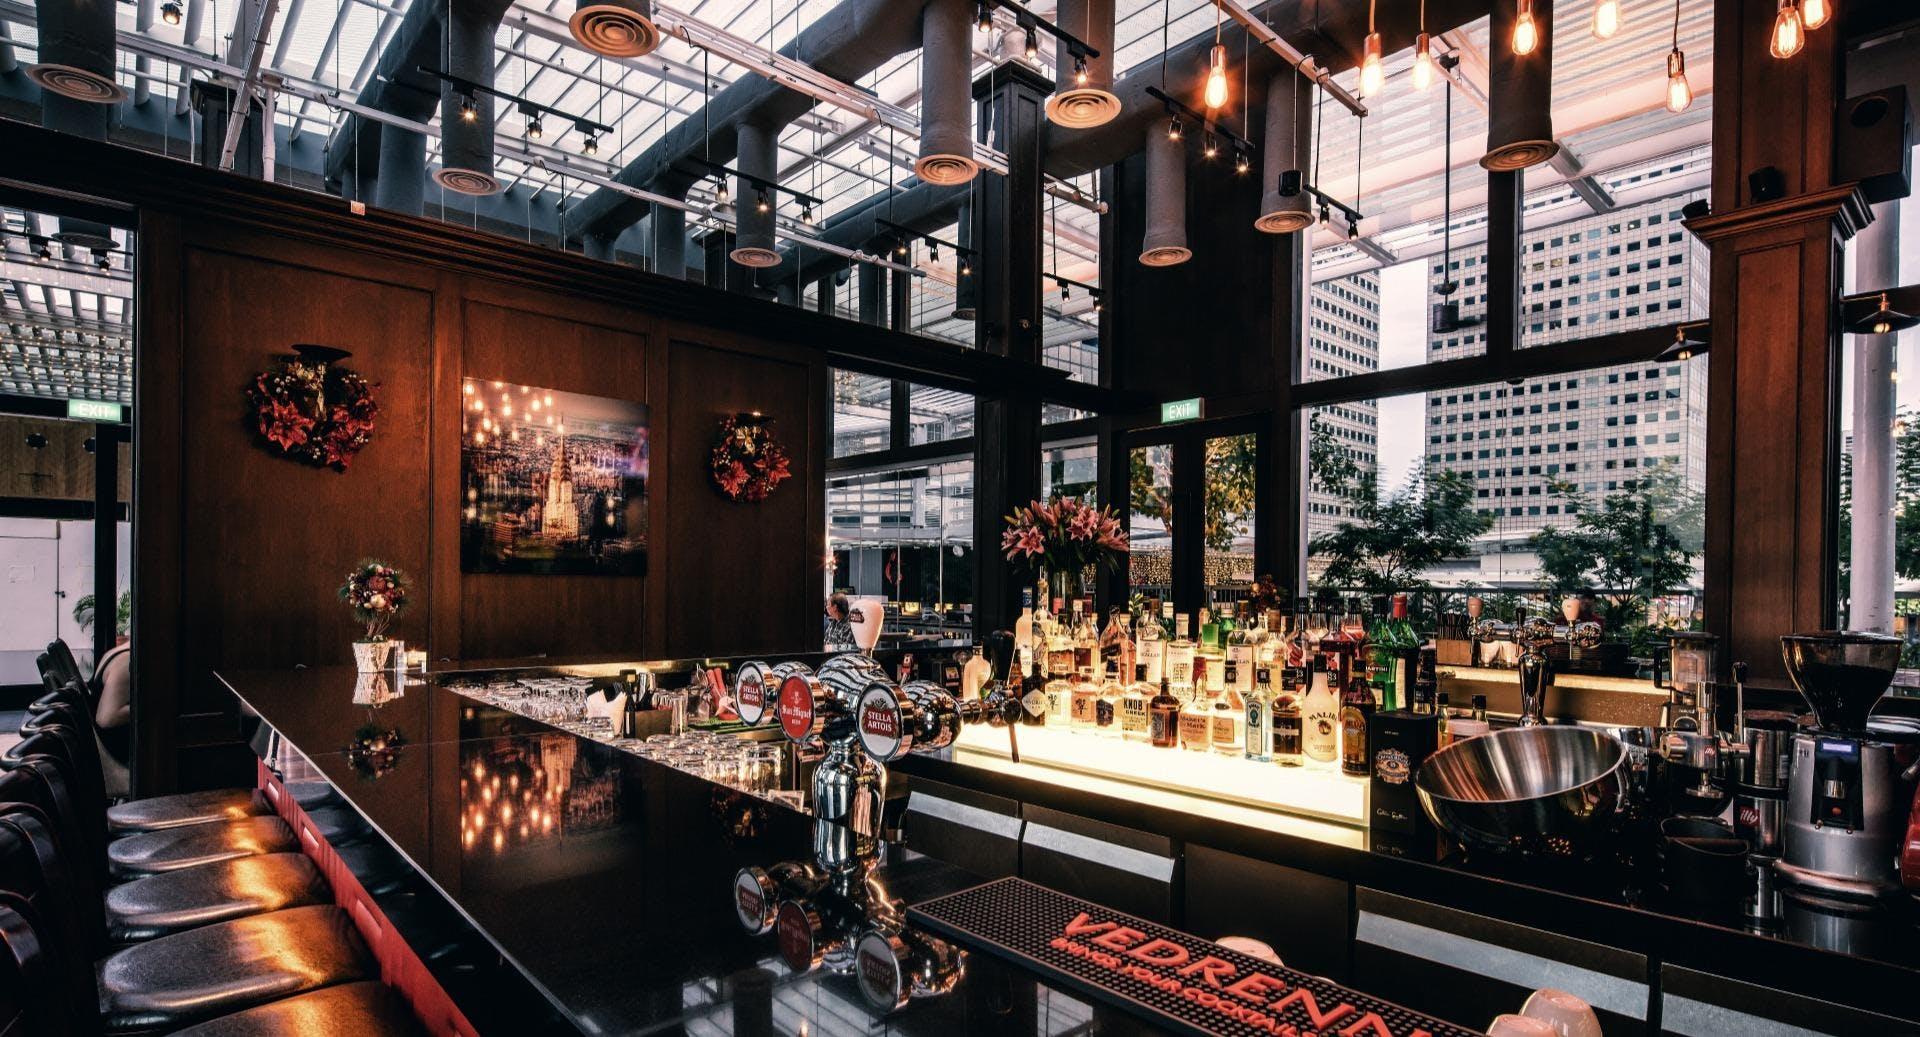 Dallas Restaurant & Bar - Suntec City Singapore image 3